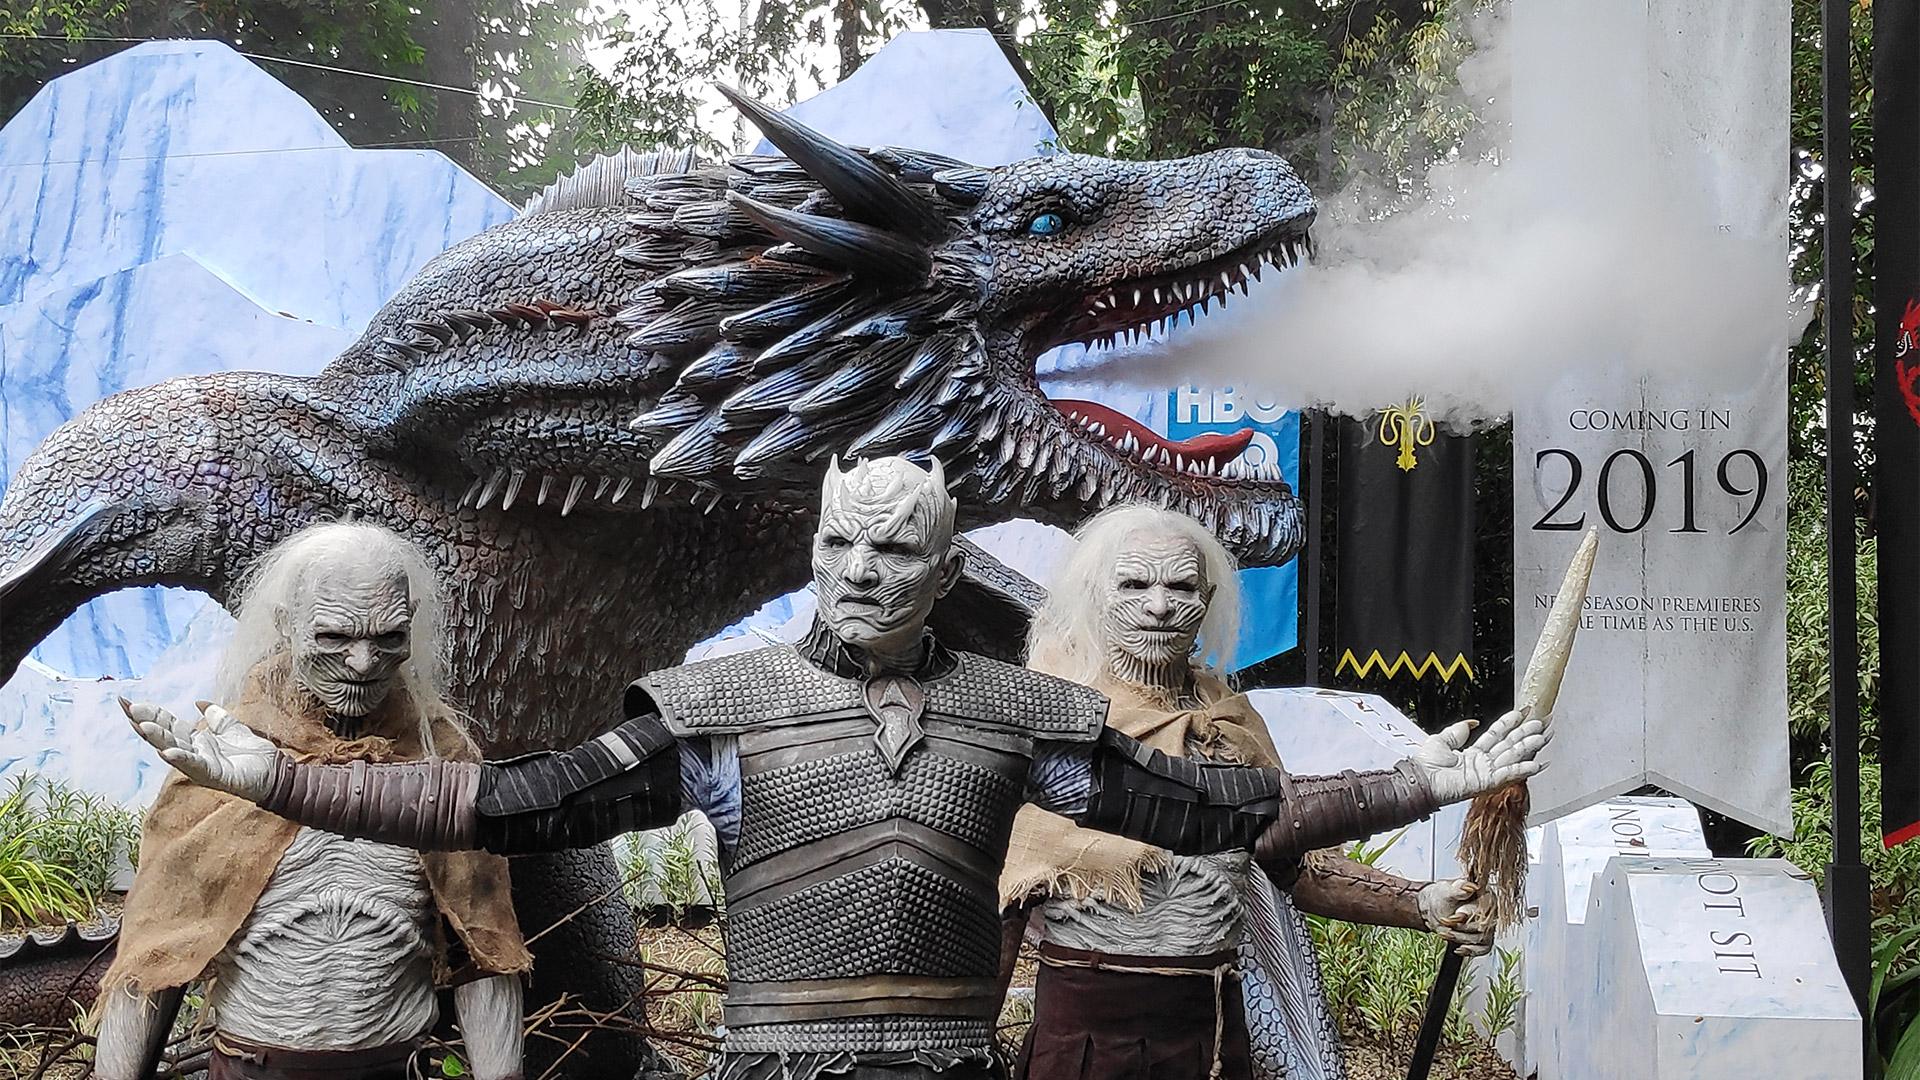 Singapore Zoo - Dragons & Beasts 01